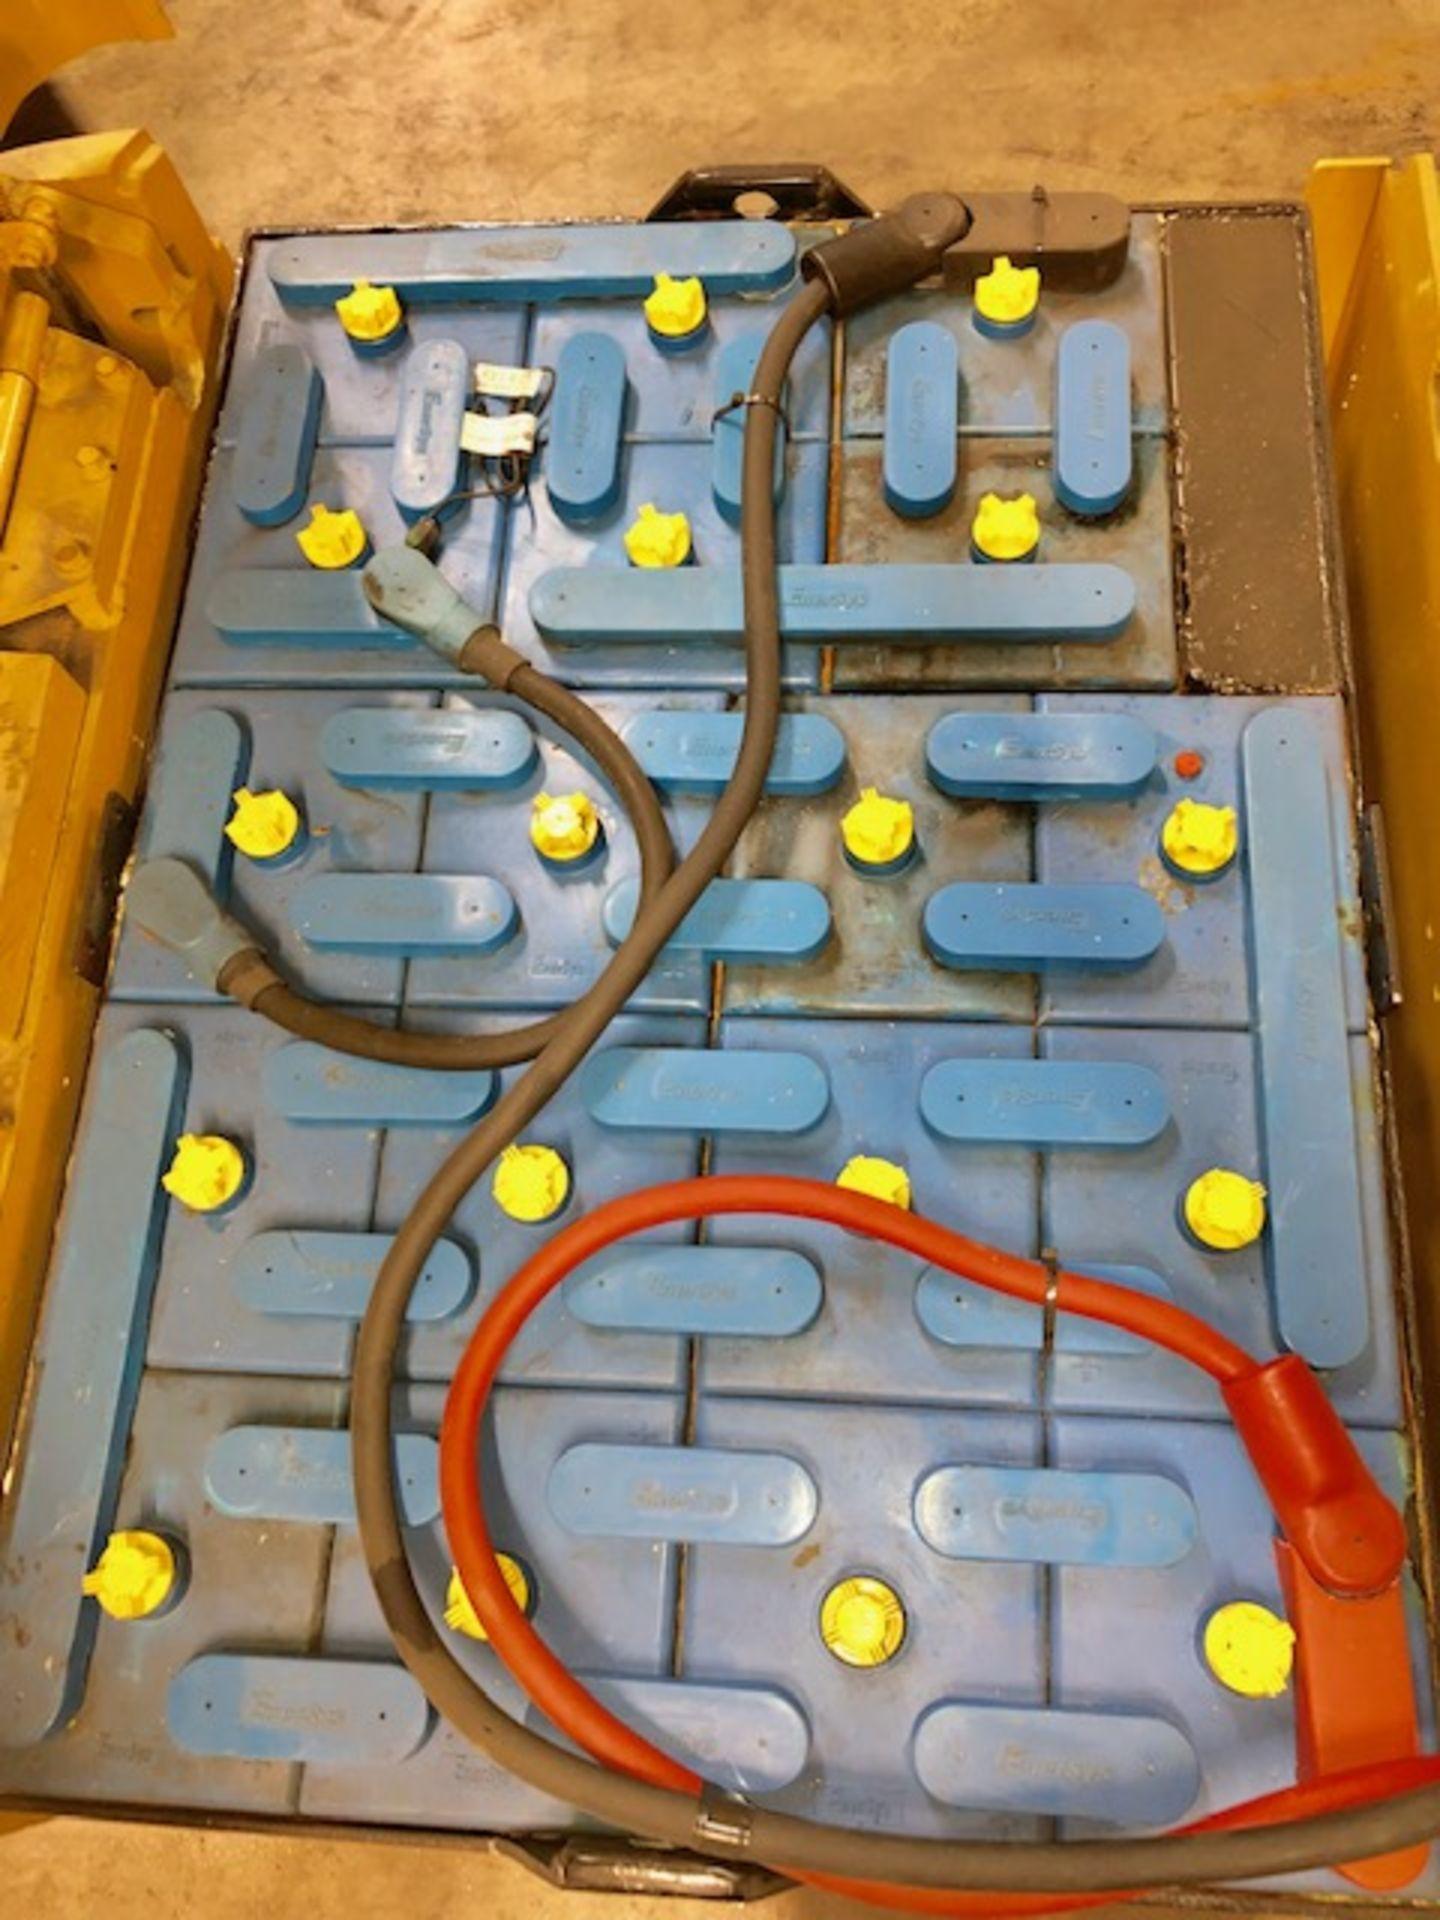 Lot 2 - CAT forklift 2EC15 w/36V battery